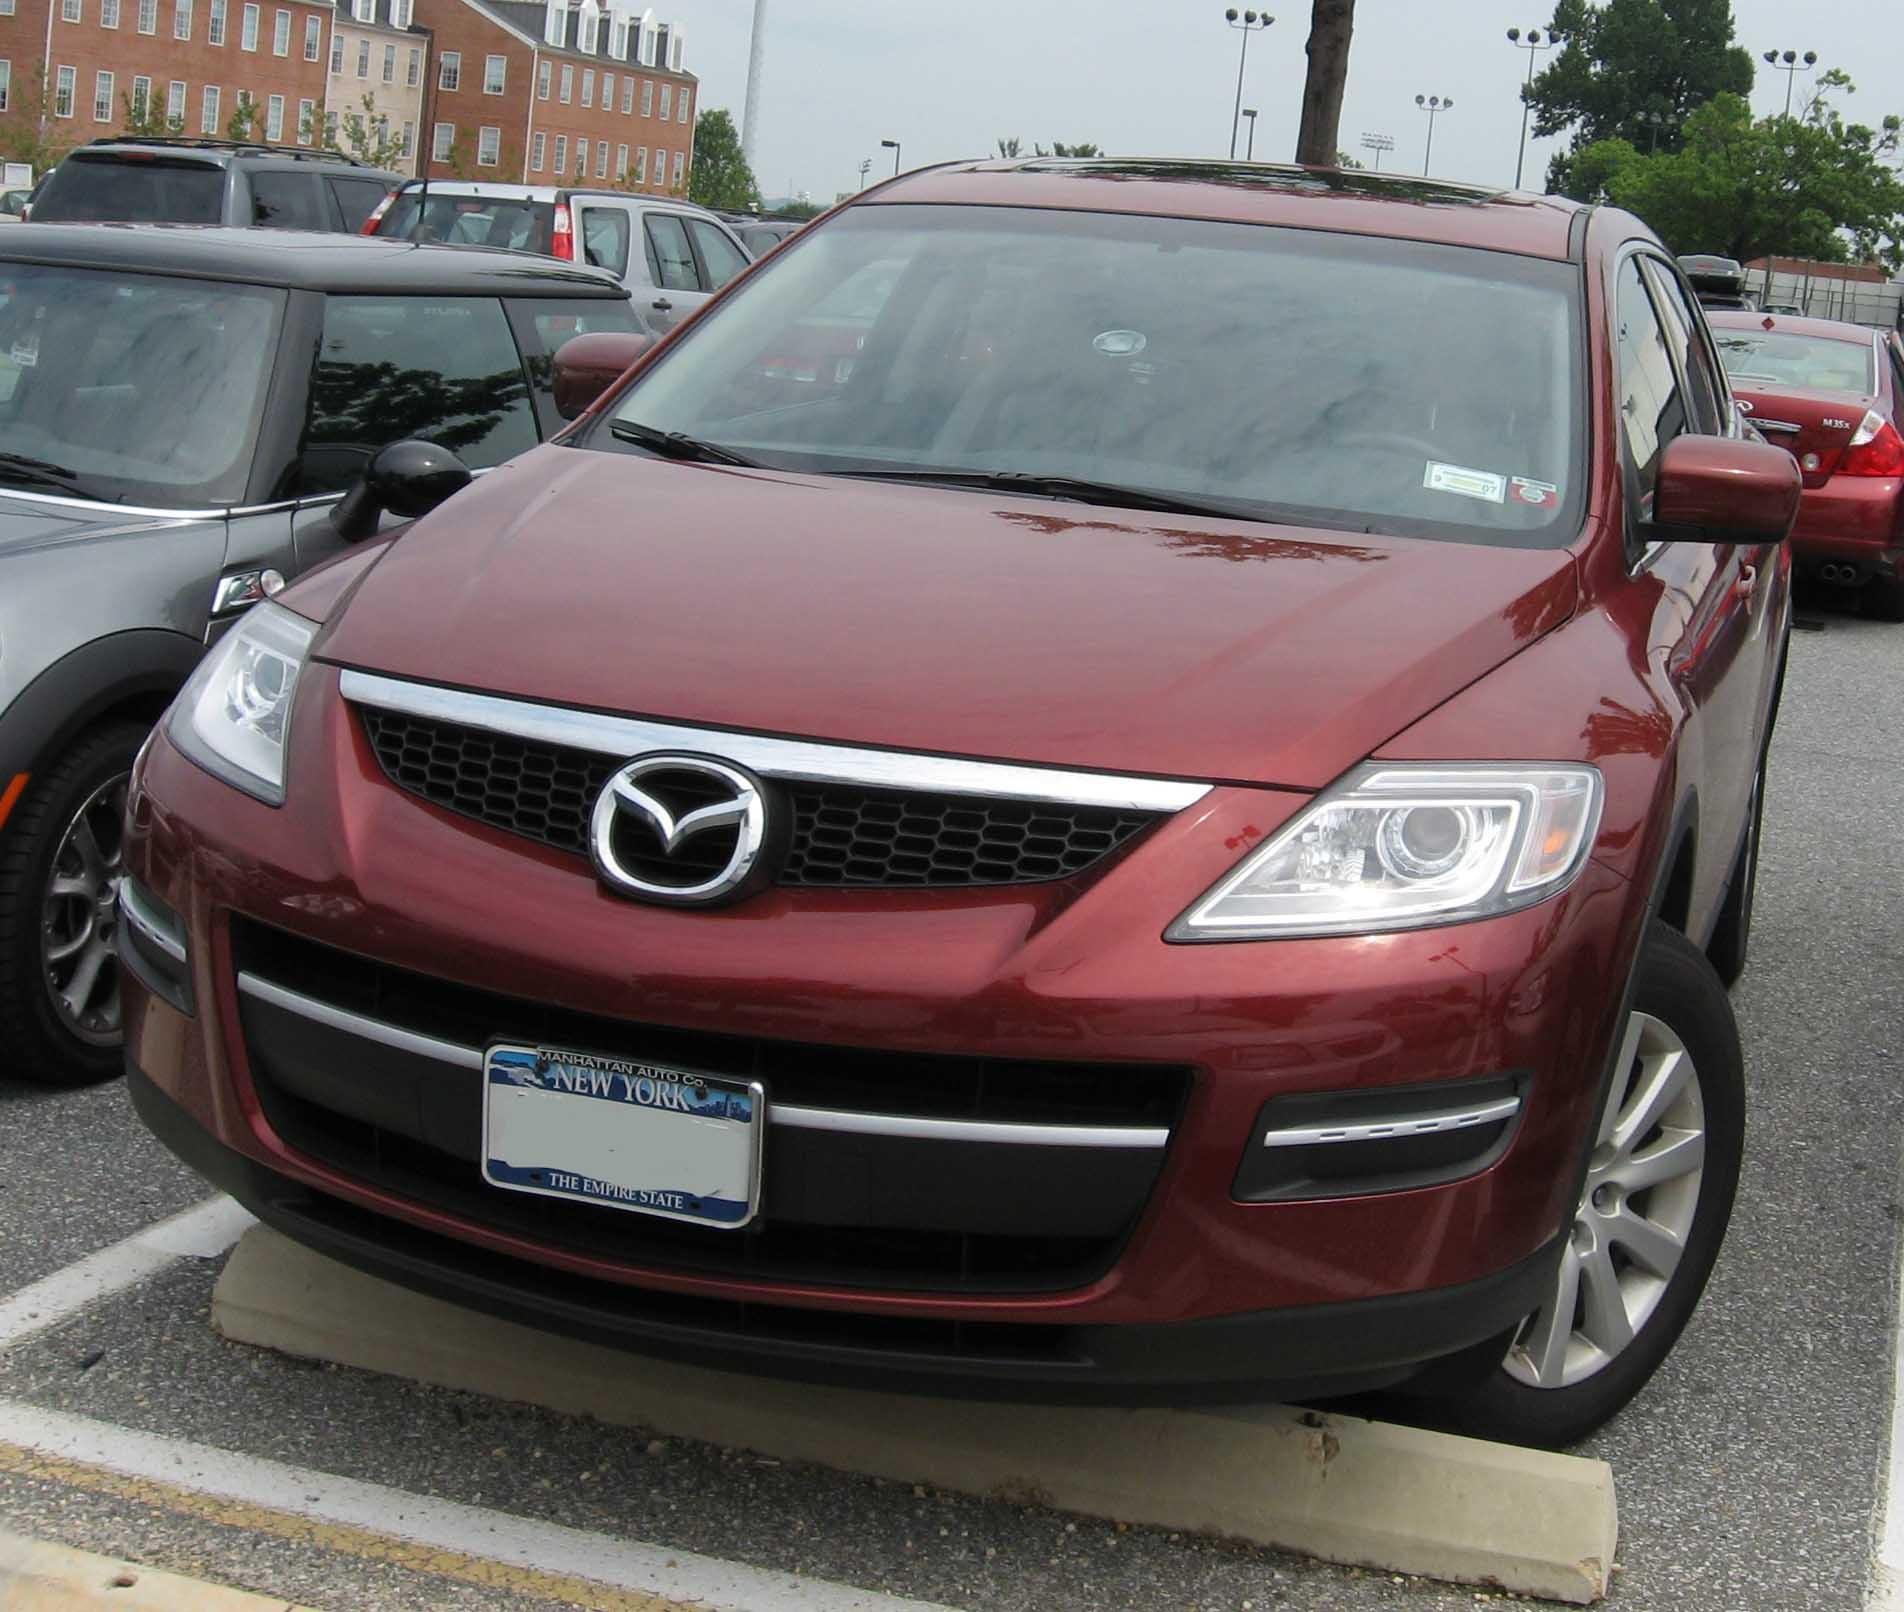 File:2007 Mazda CX9